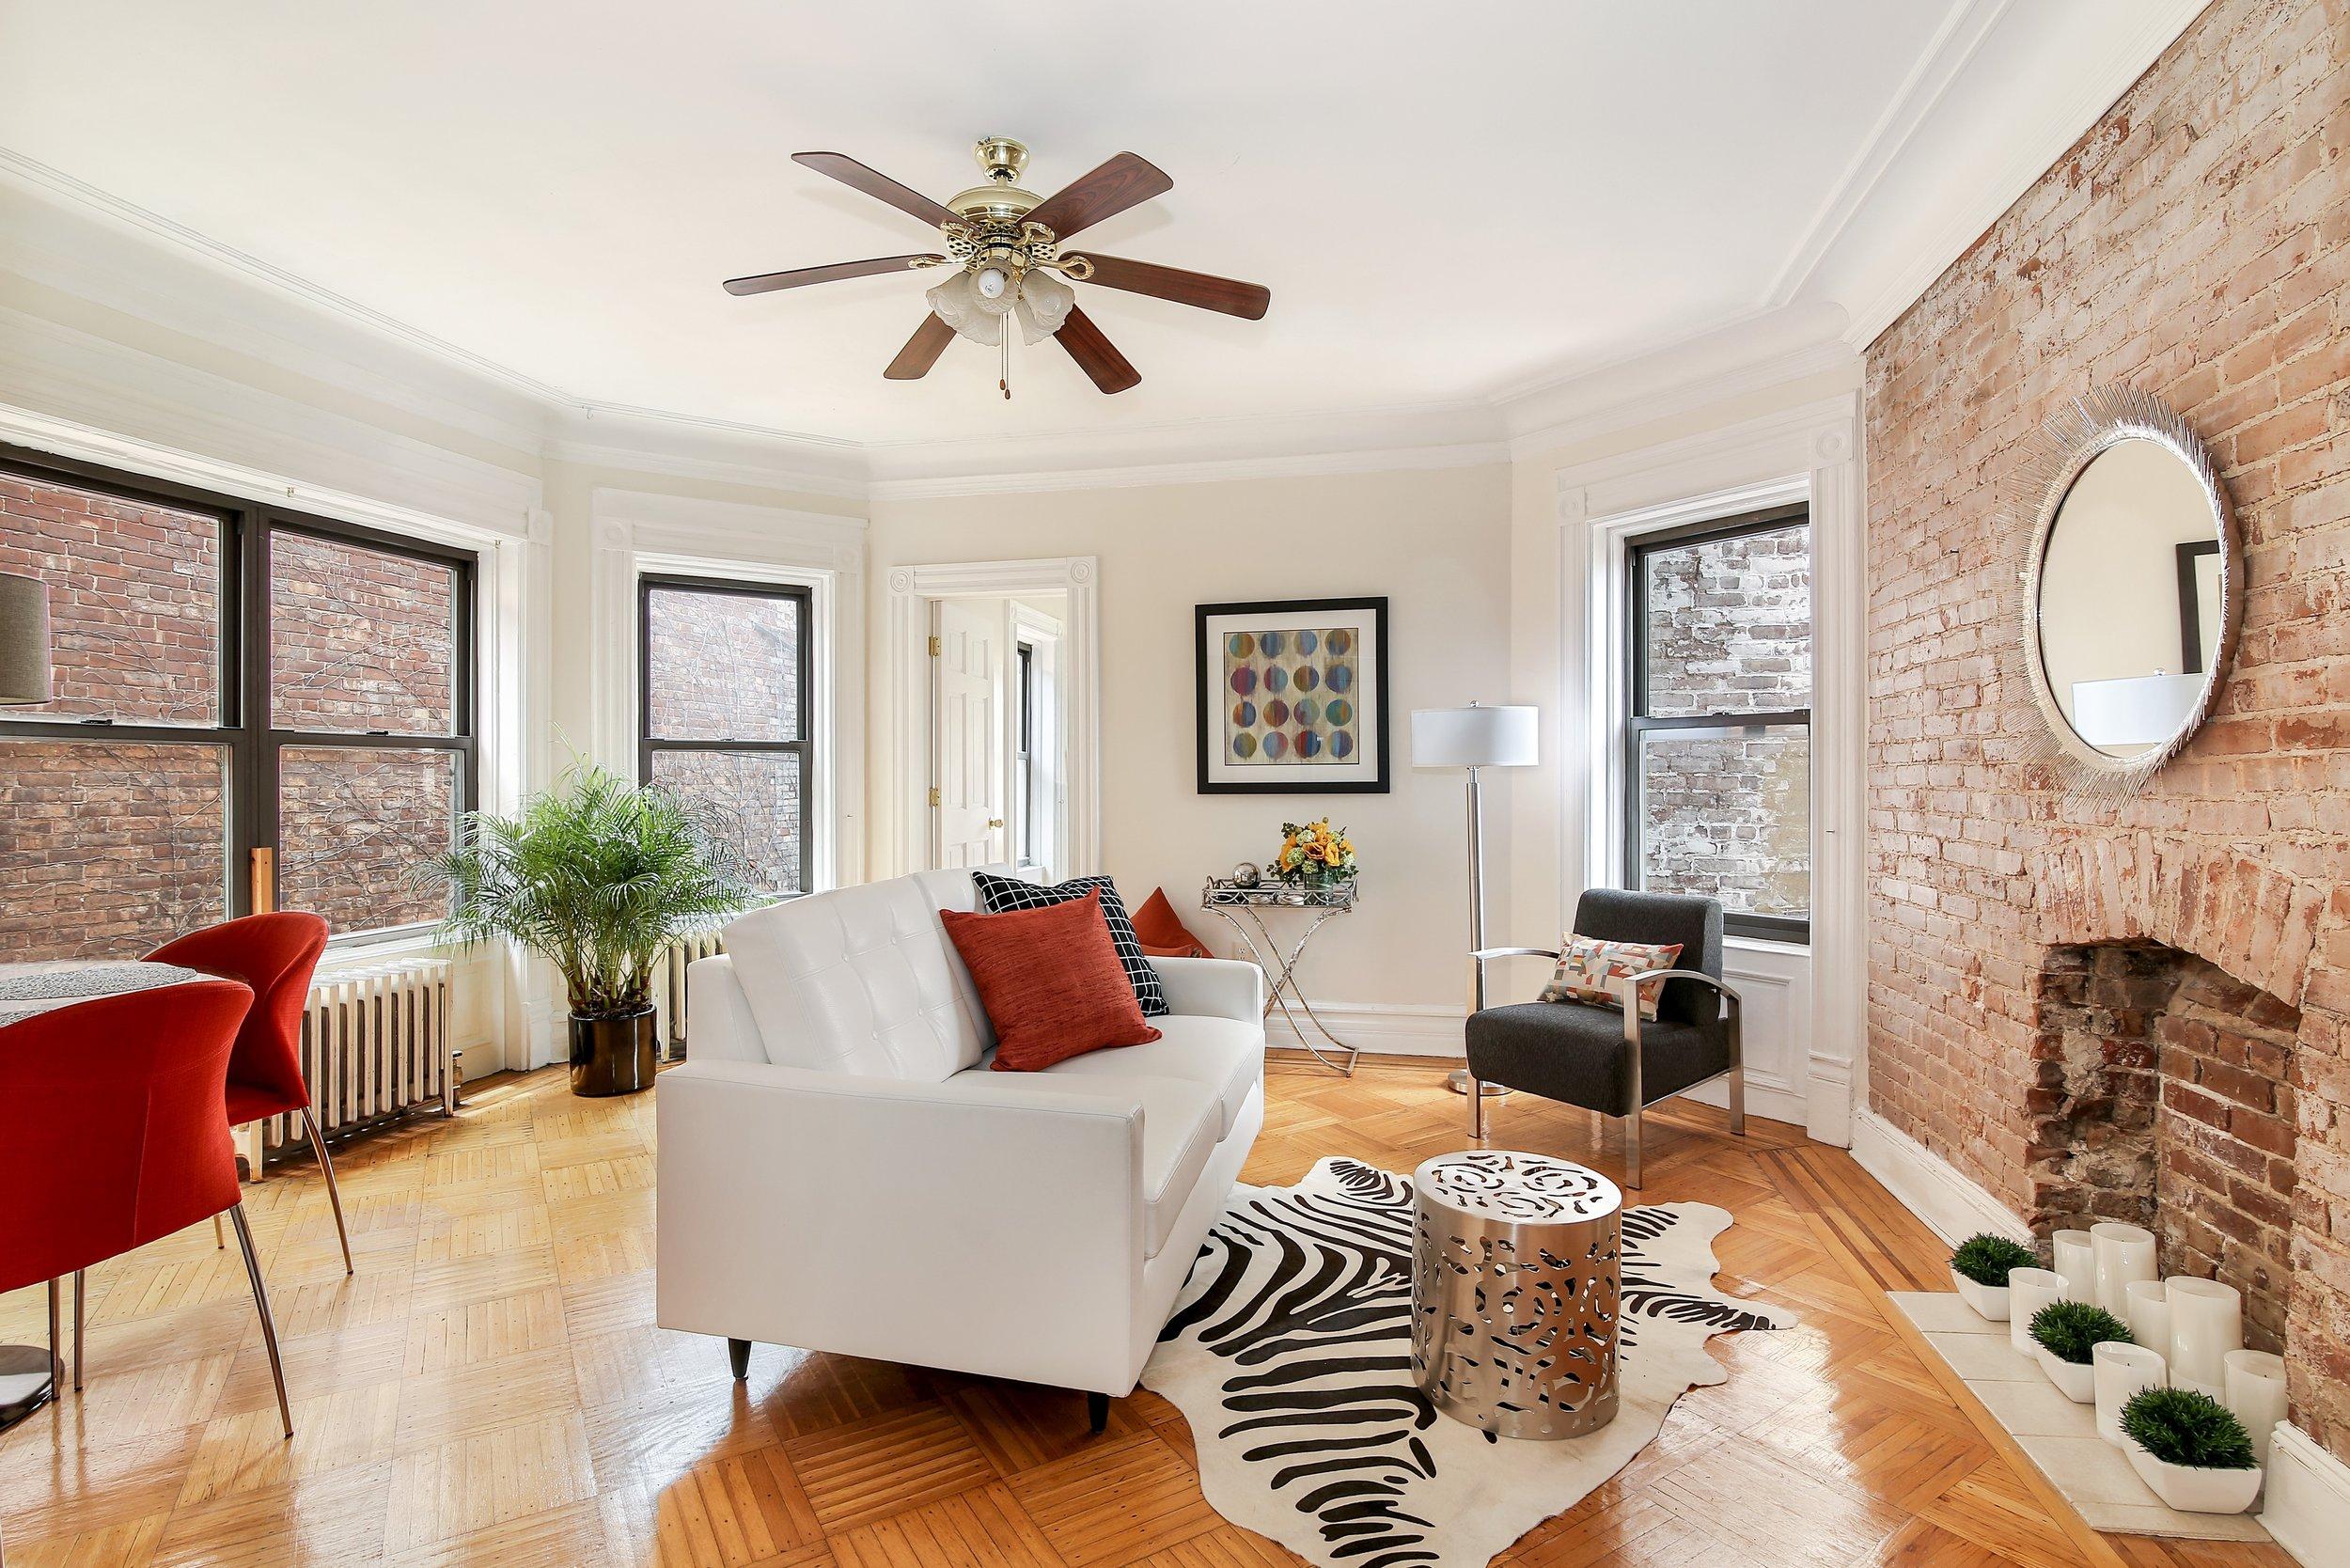 184 Clinton Ave Living room.jpg